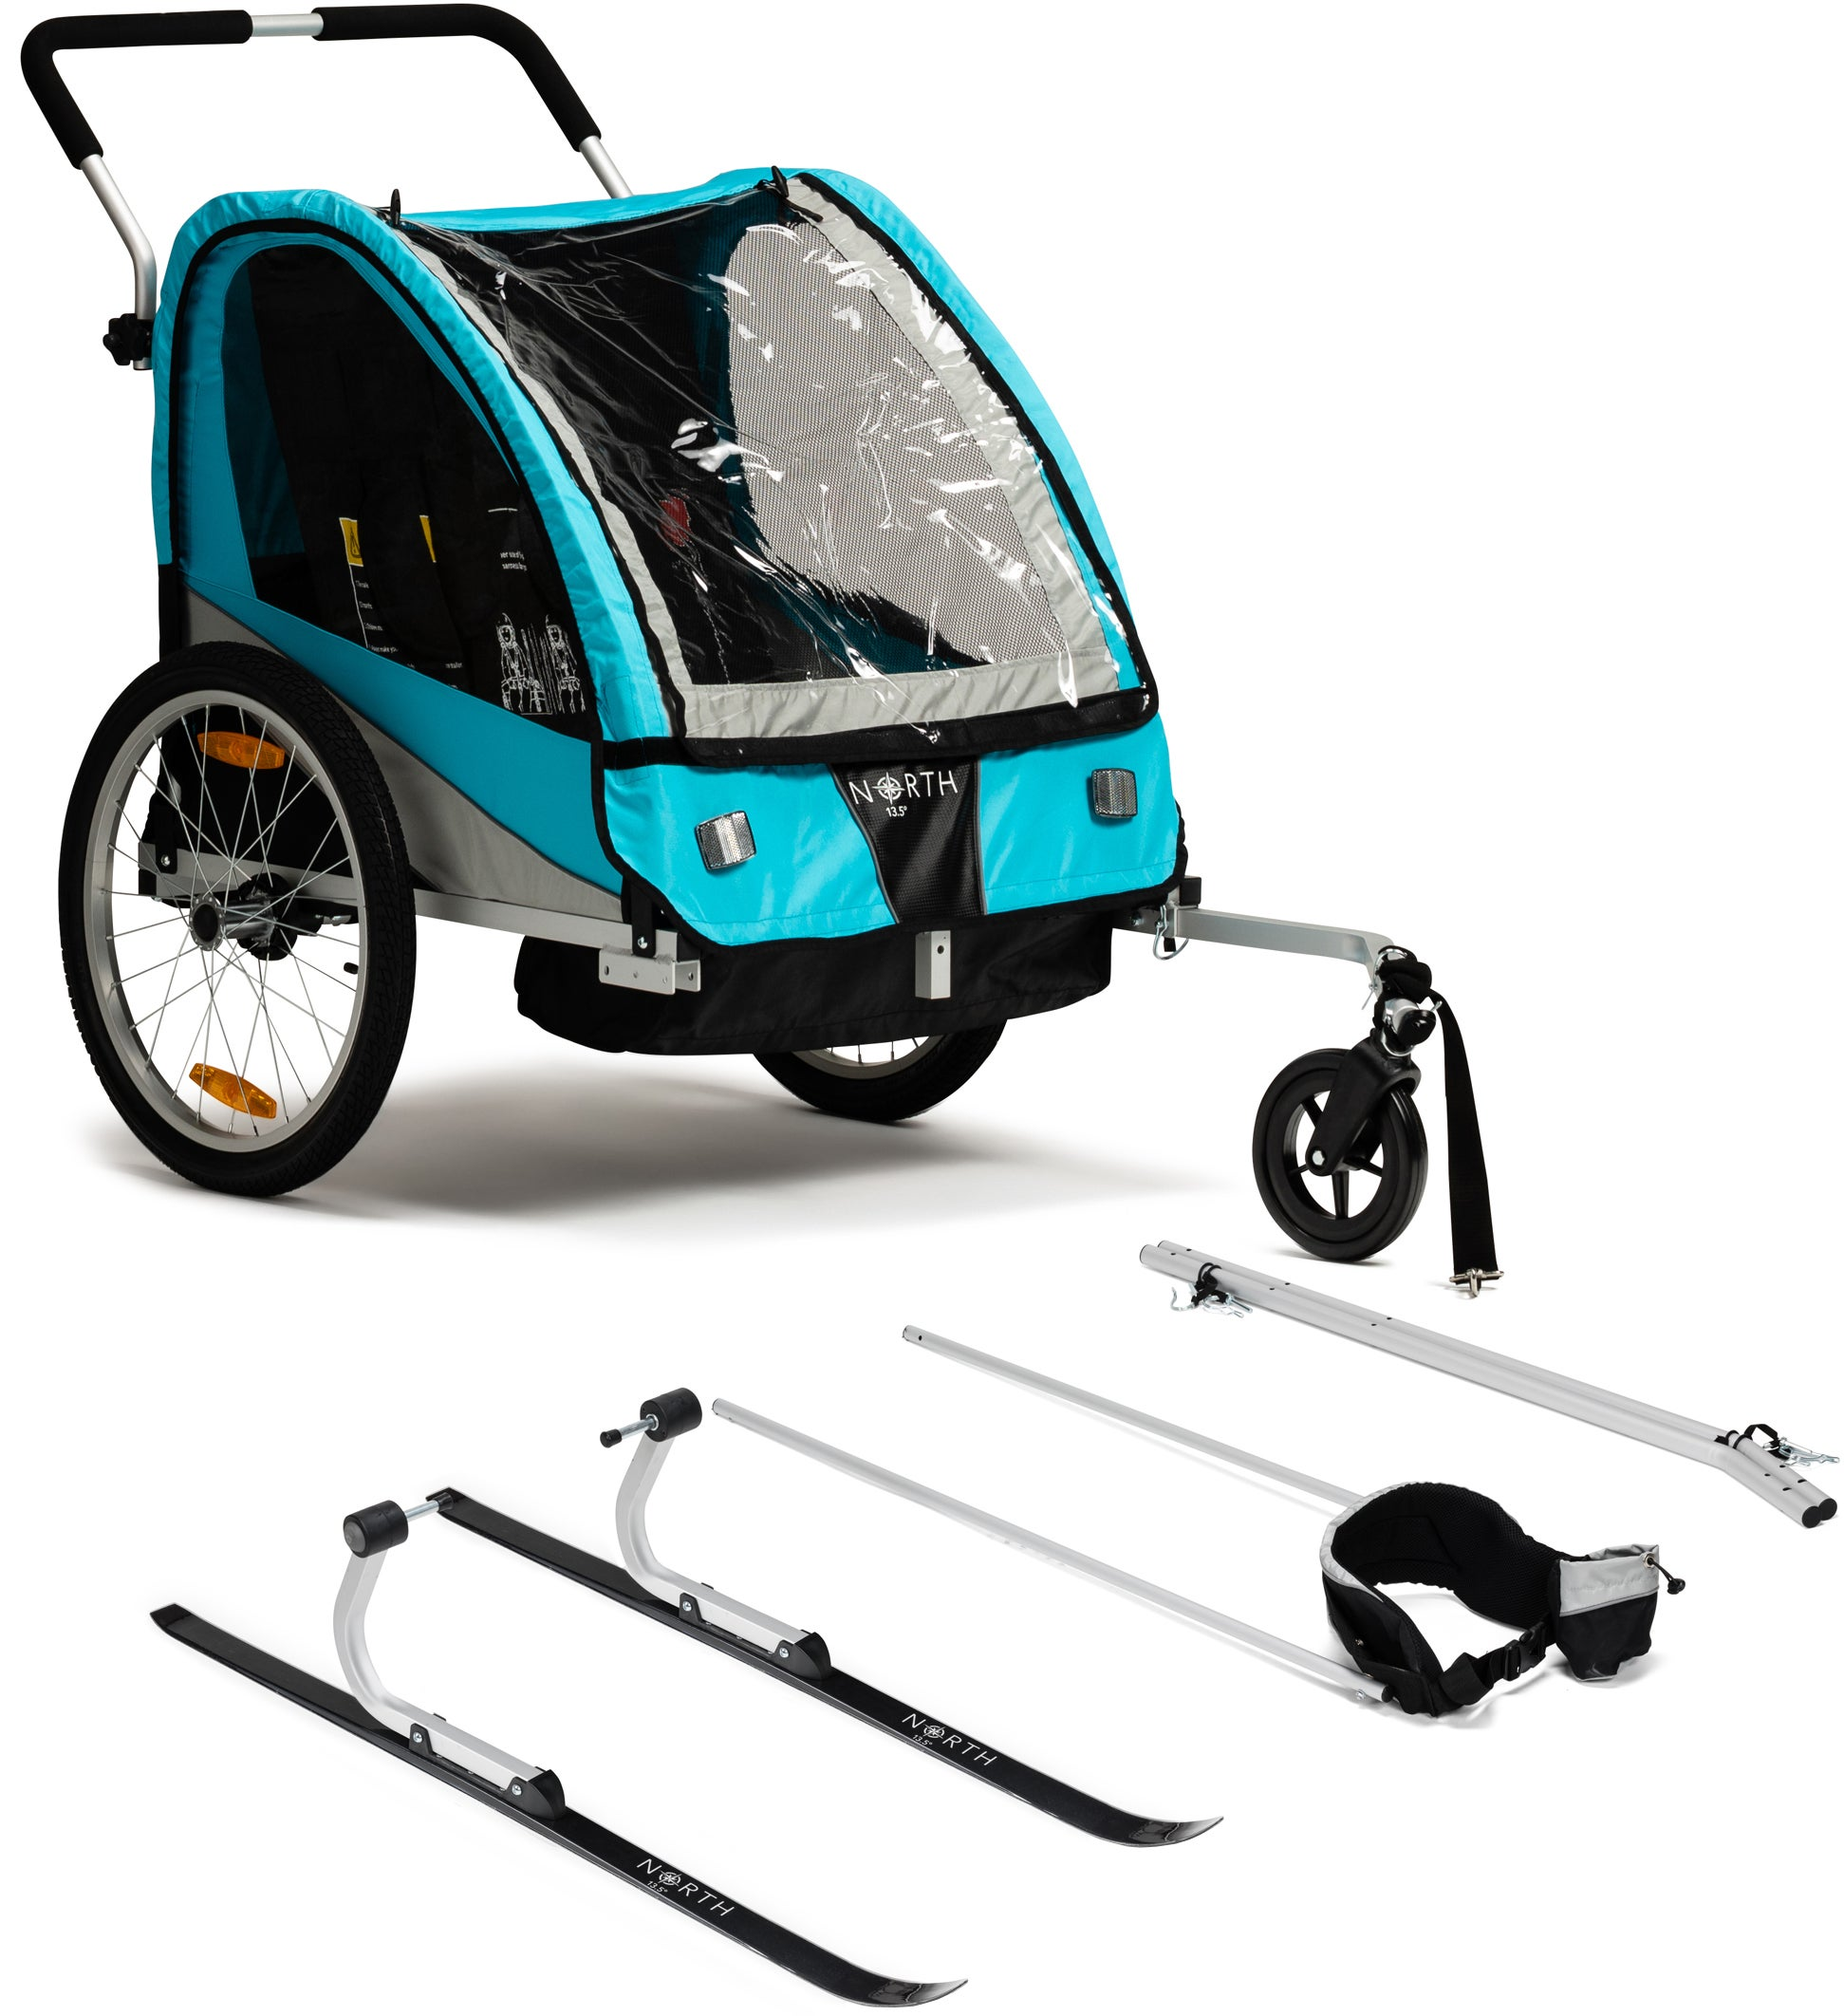 North 13.5 Roadster Cykelvagn, Blue Inkl. Skidset